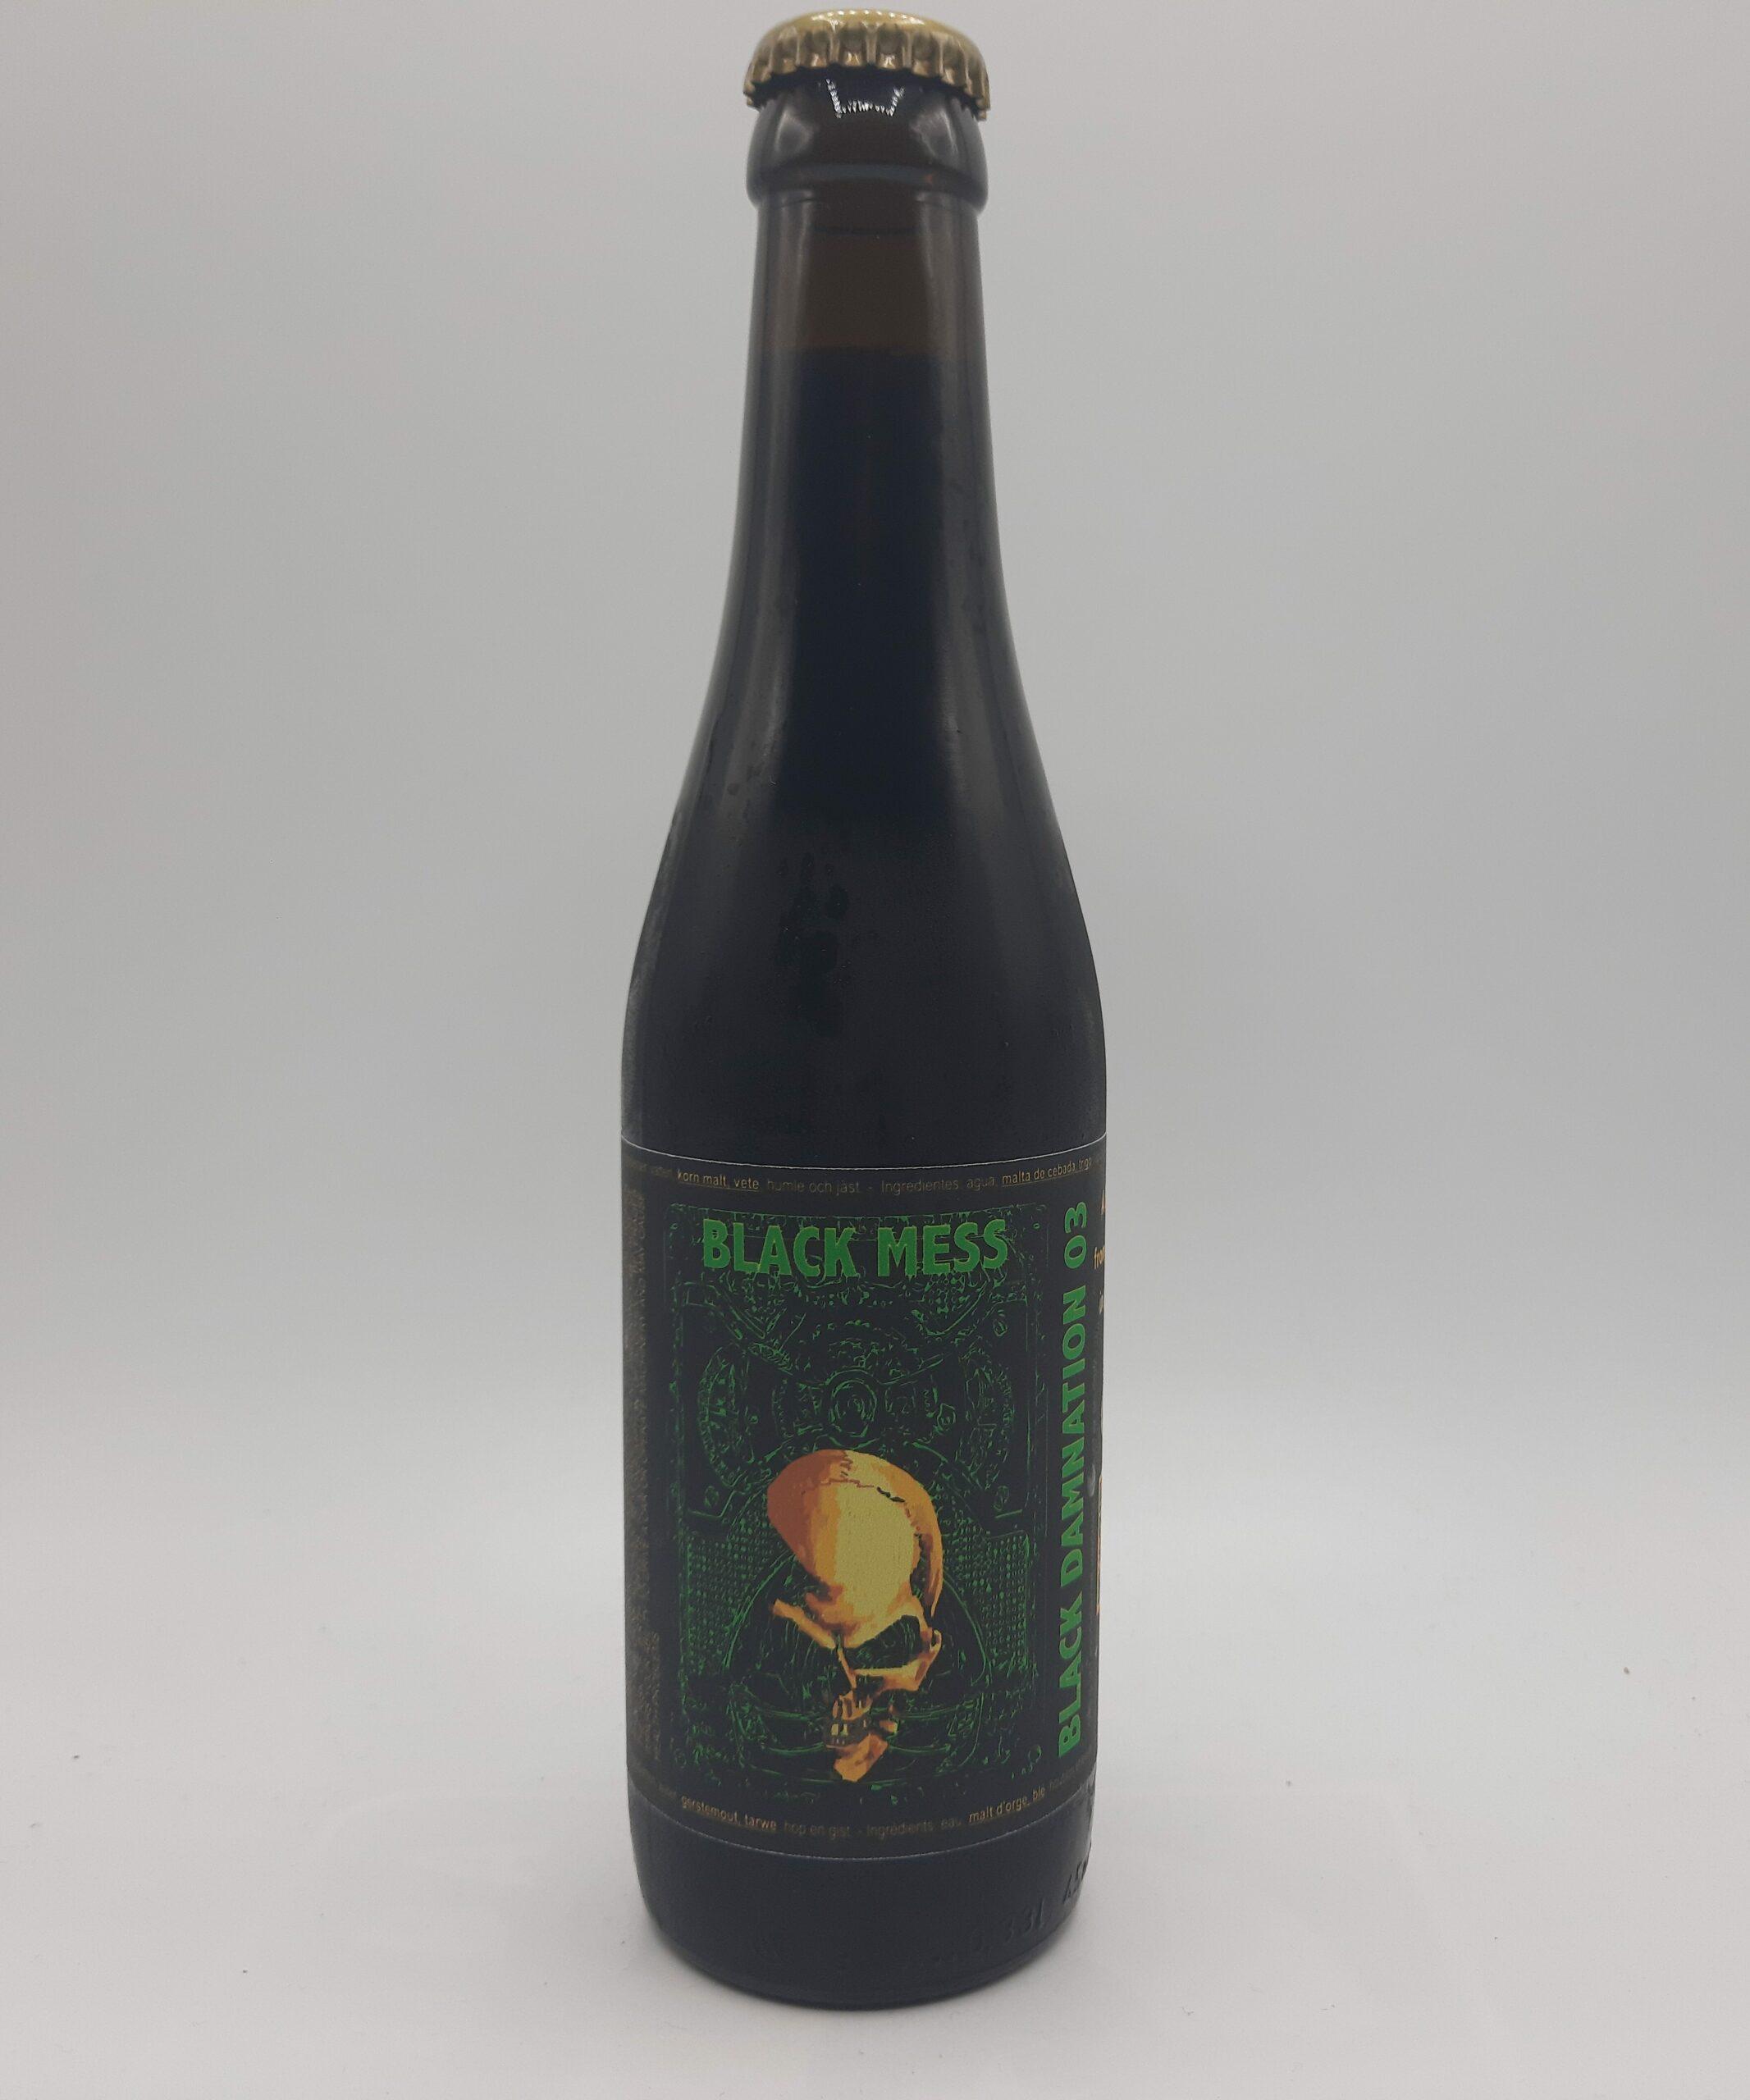 Struise | Black Damnation 03 Black Mass | 2yrs Peated Whiskey Barrel Aged Imperial Stout 13% 330ml